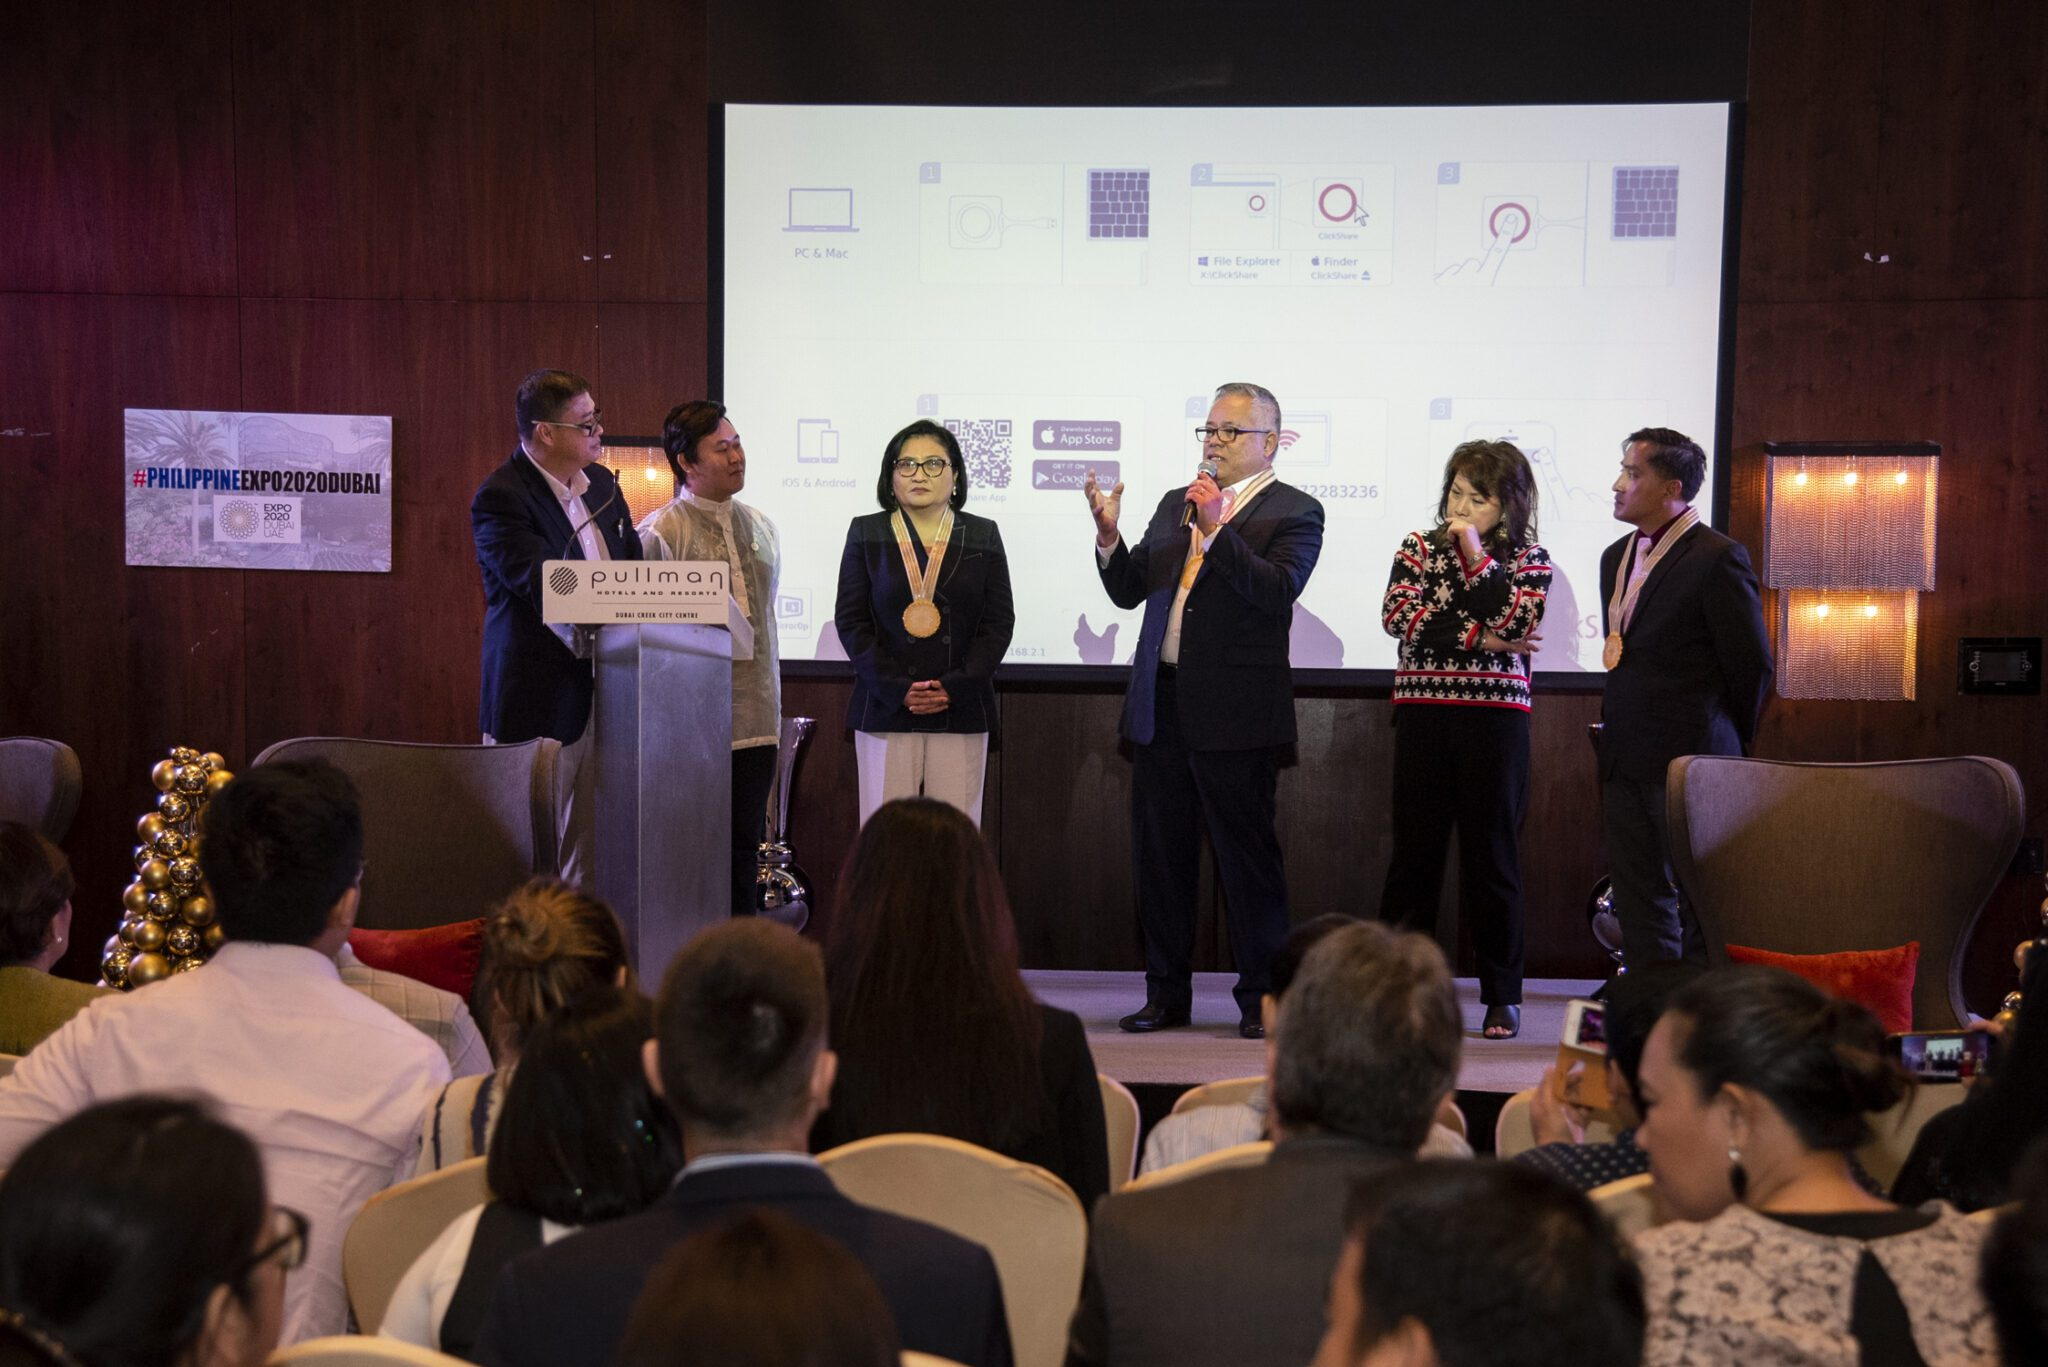 UAE Filipinos encouraged to participate in Dubai World Expo 2020